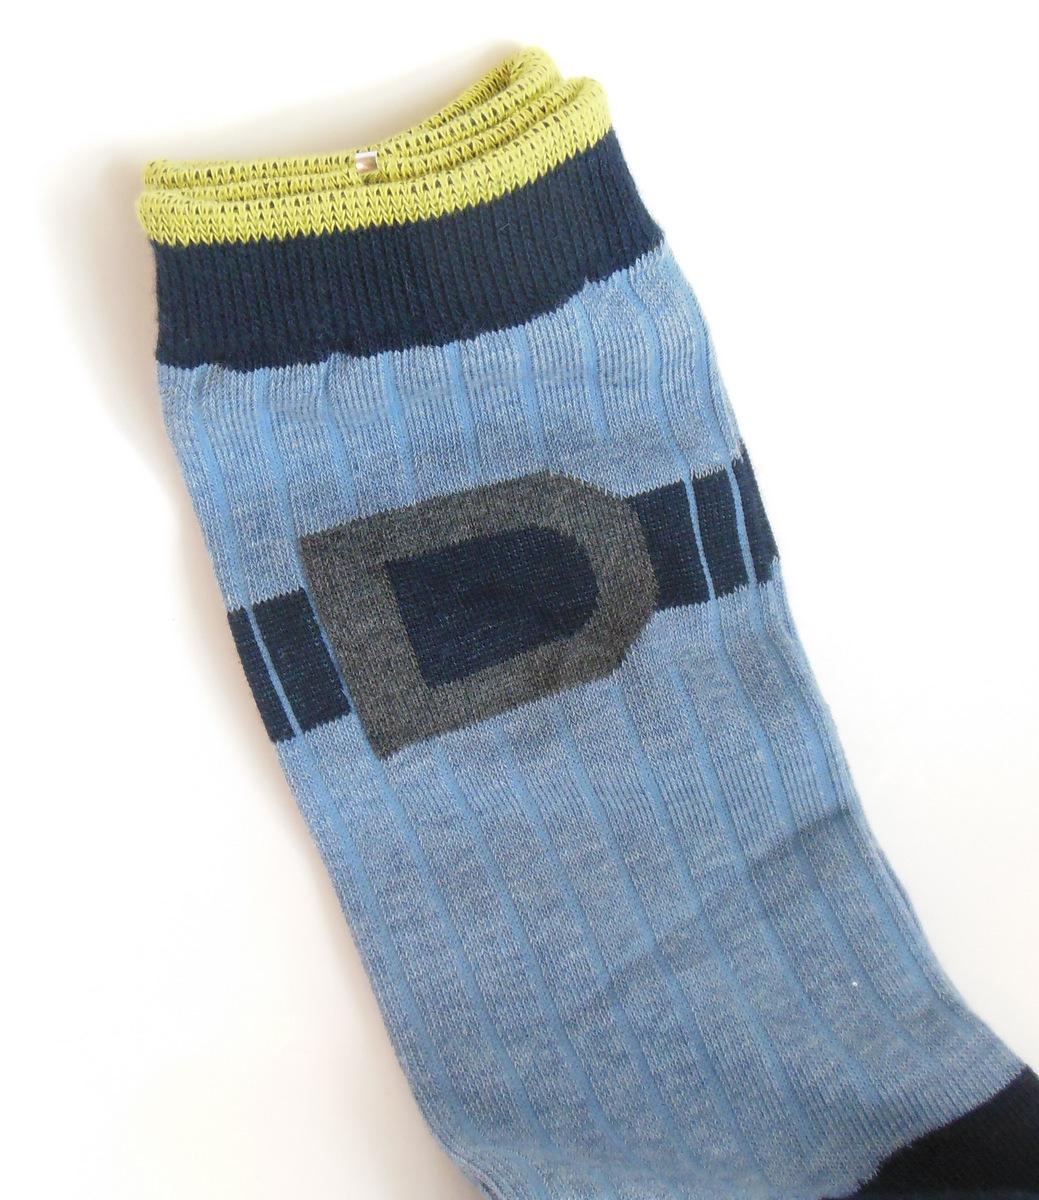 e96803b19 DKNY Donna Karan Calf Socks Sz 9 to 11 Two and 50 similar items